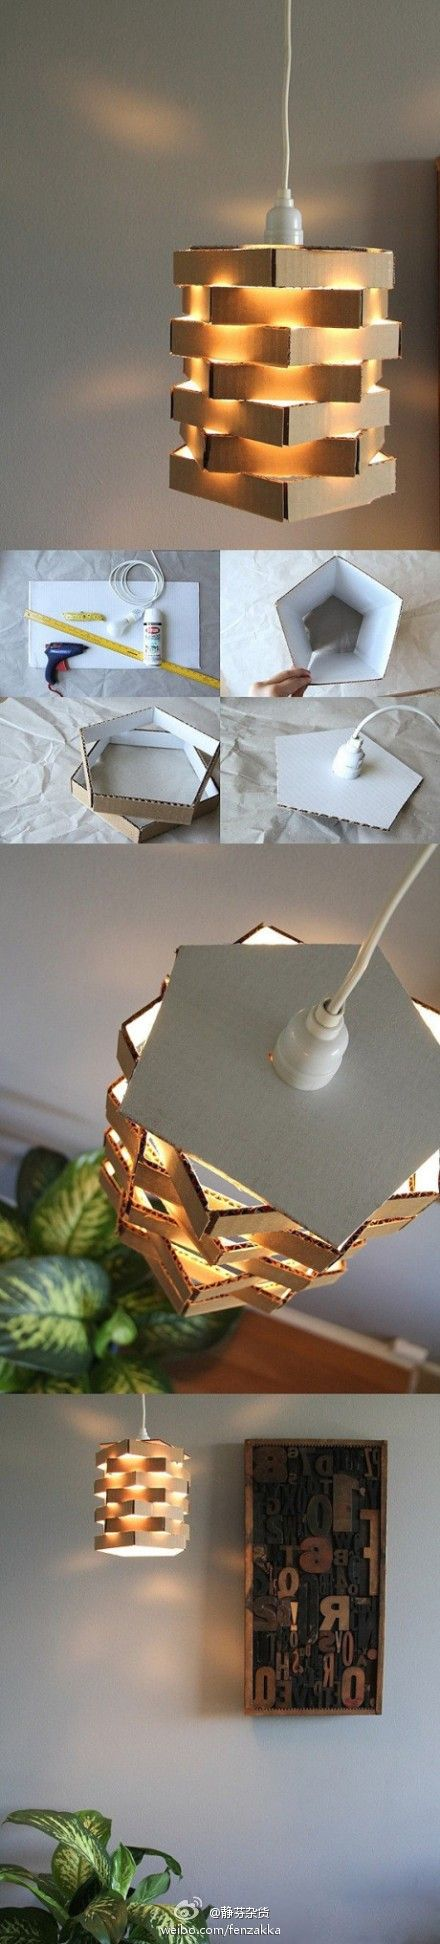 recycling ideas 14